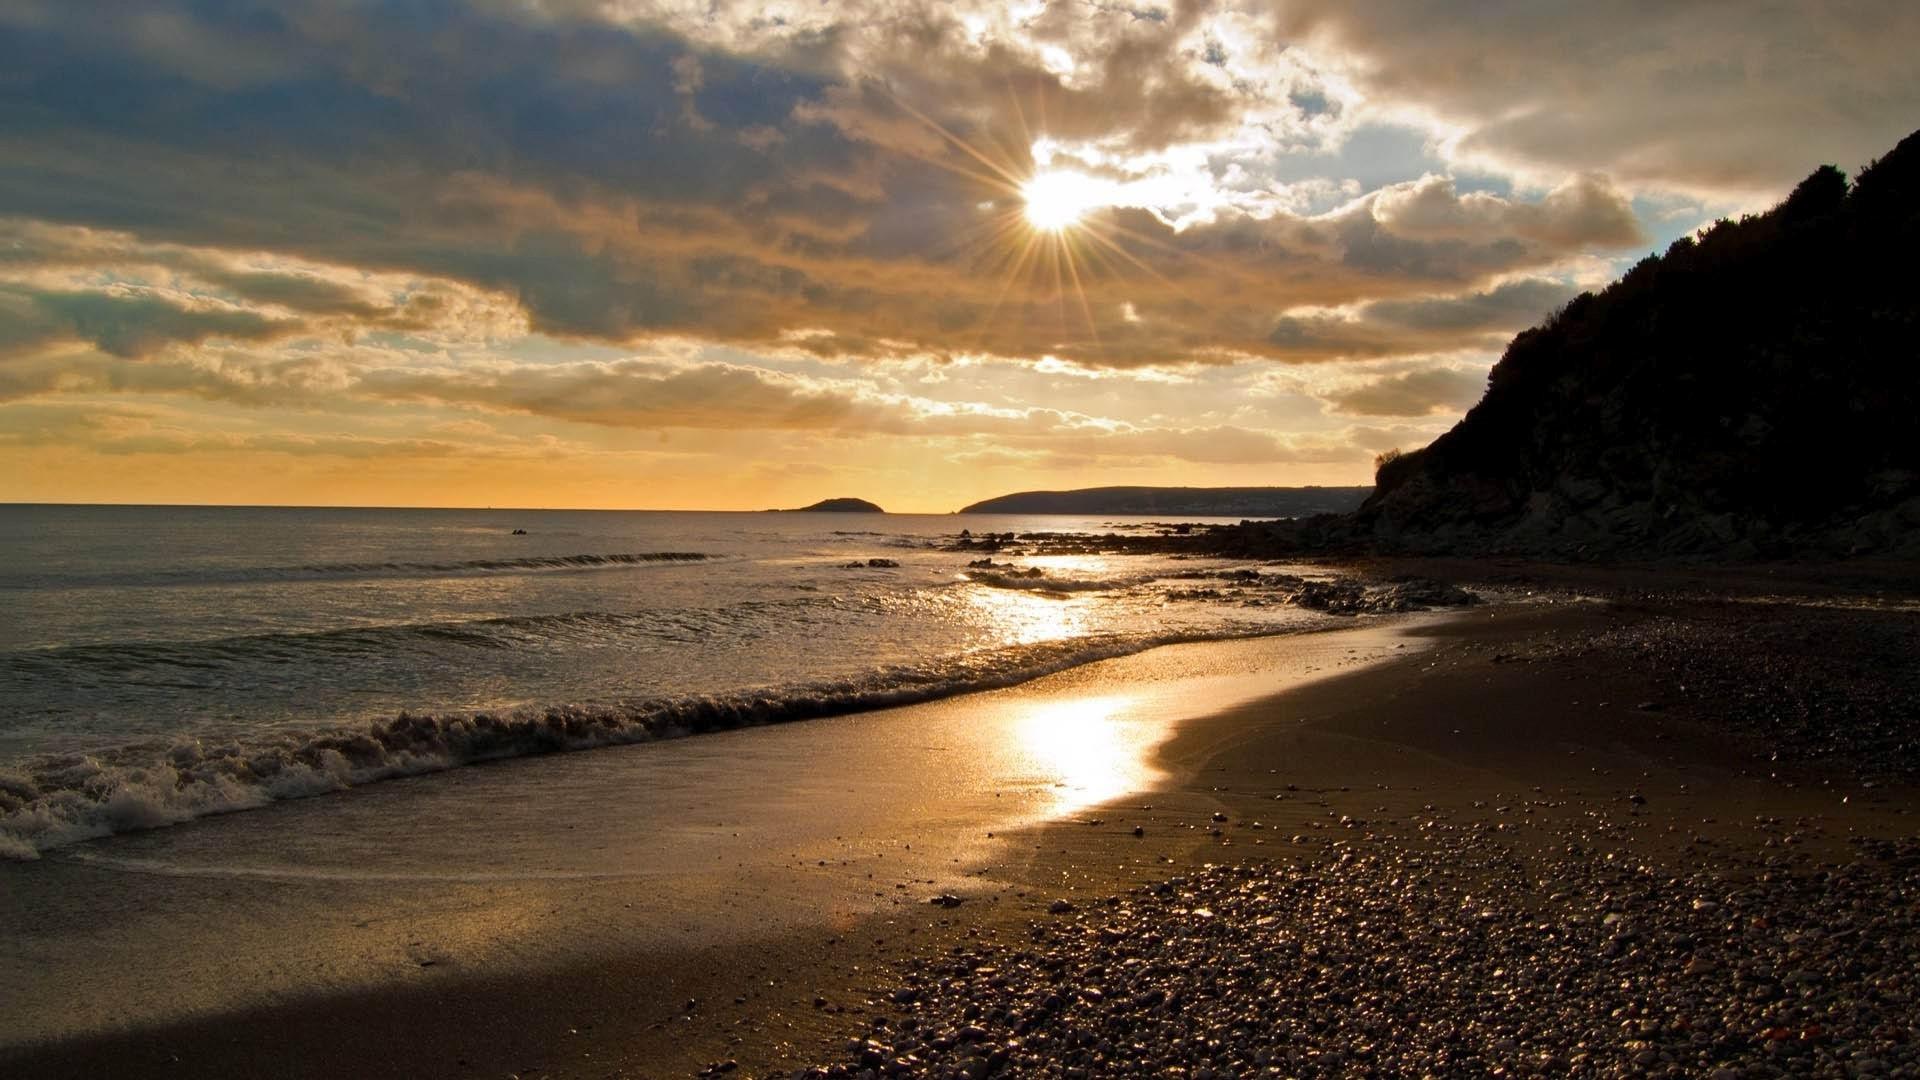 Картинка море закат песок